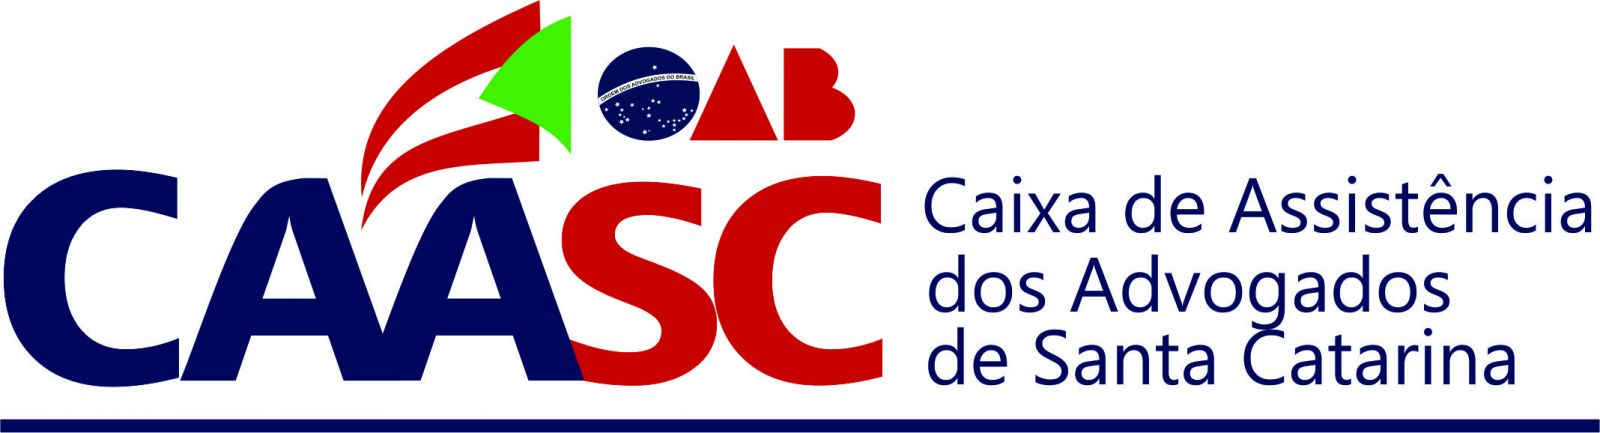 CAASC